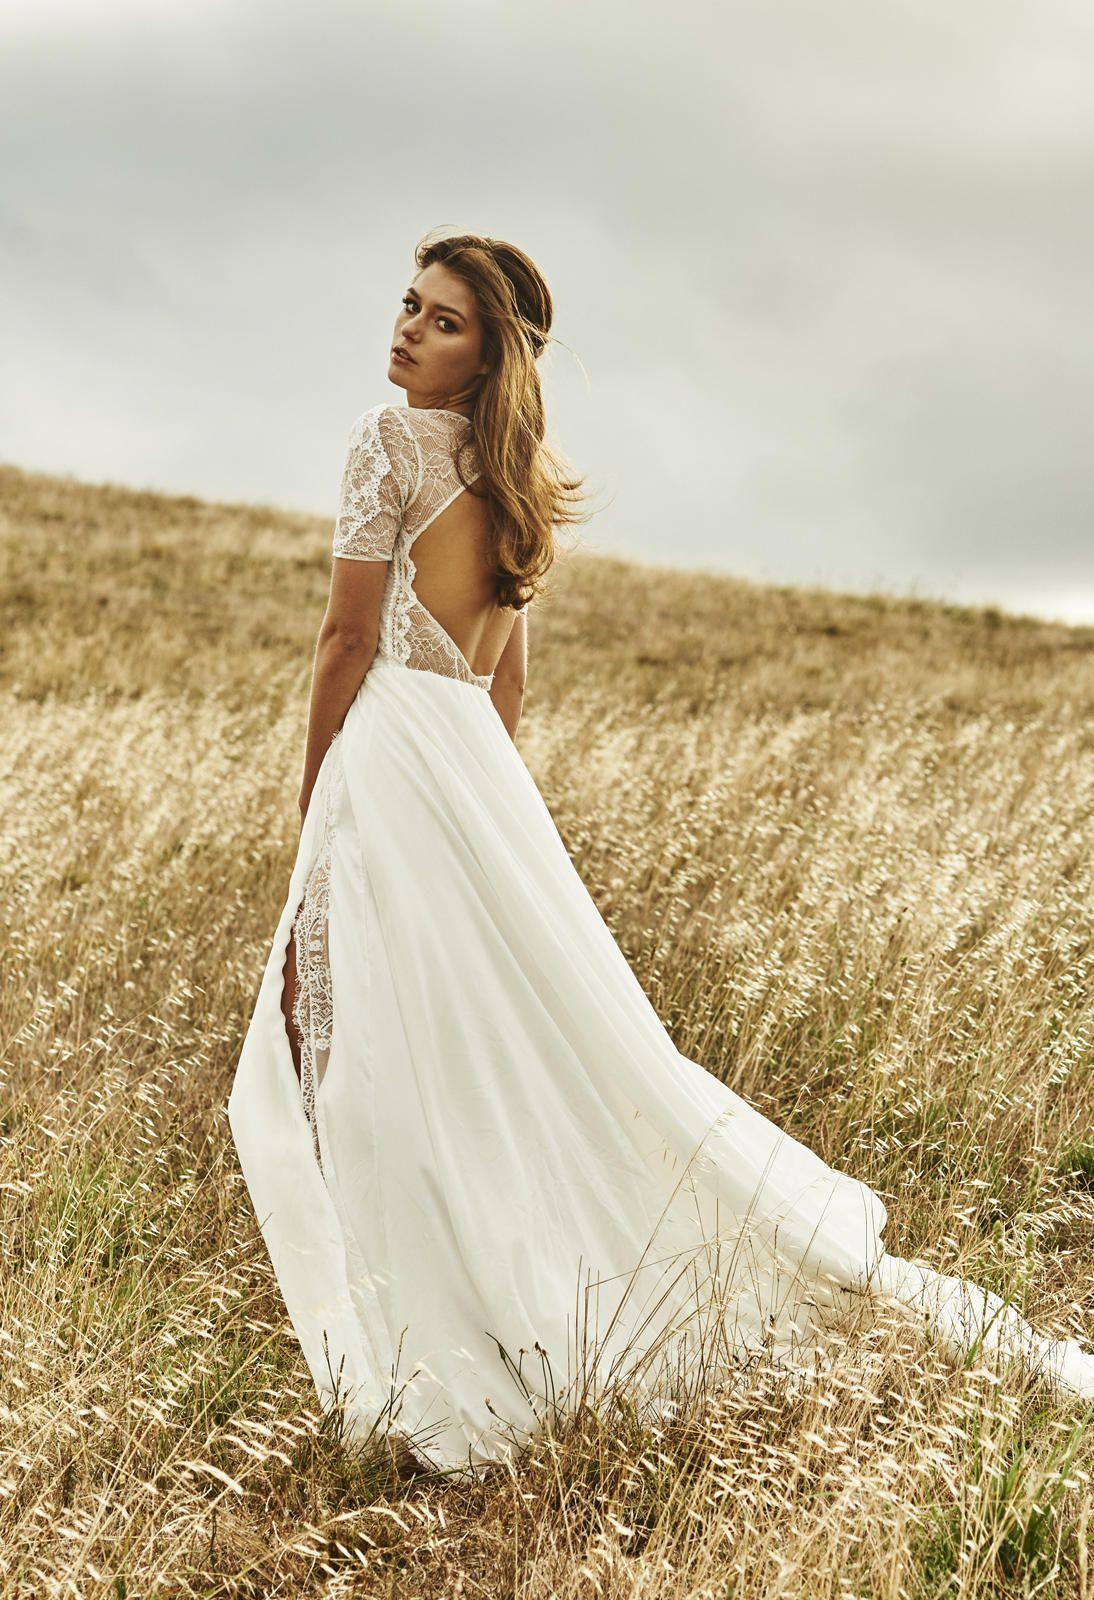 Rustic Style Wedding Dress